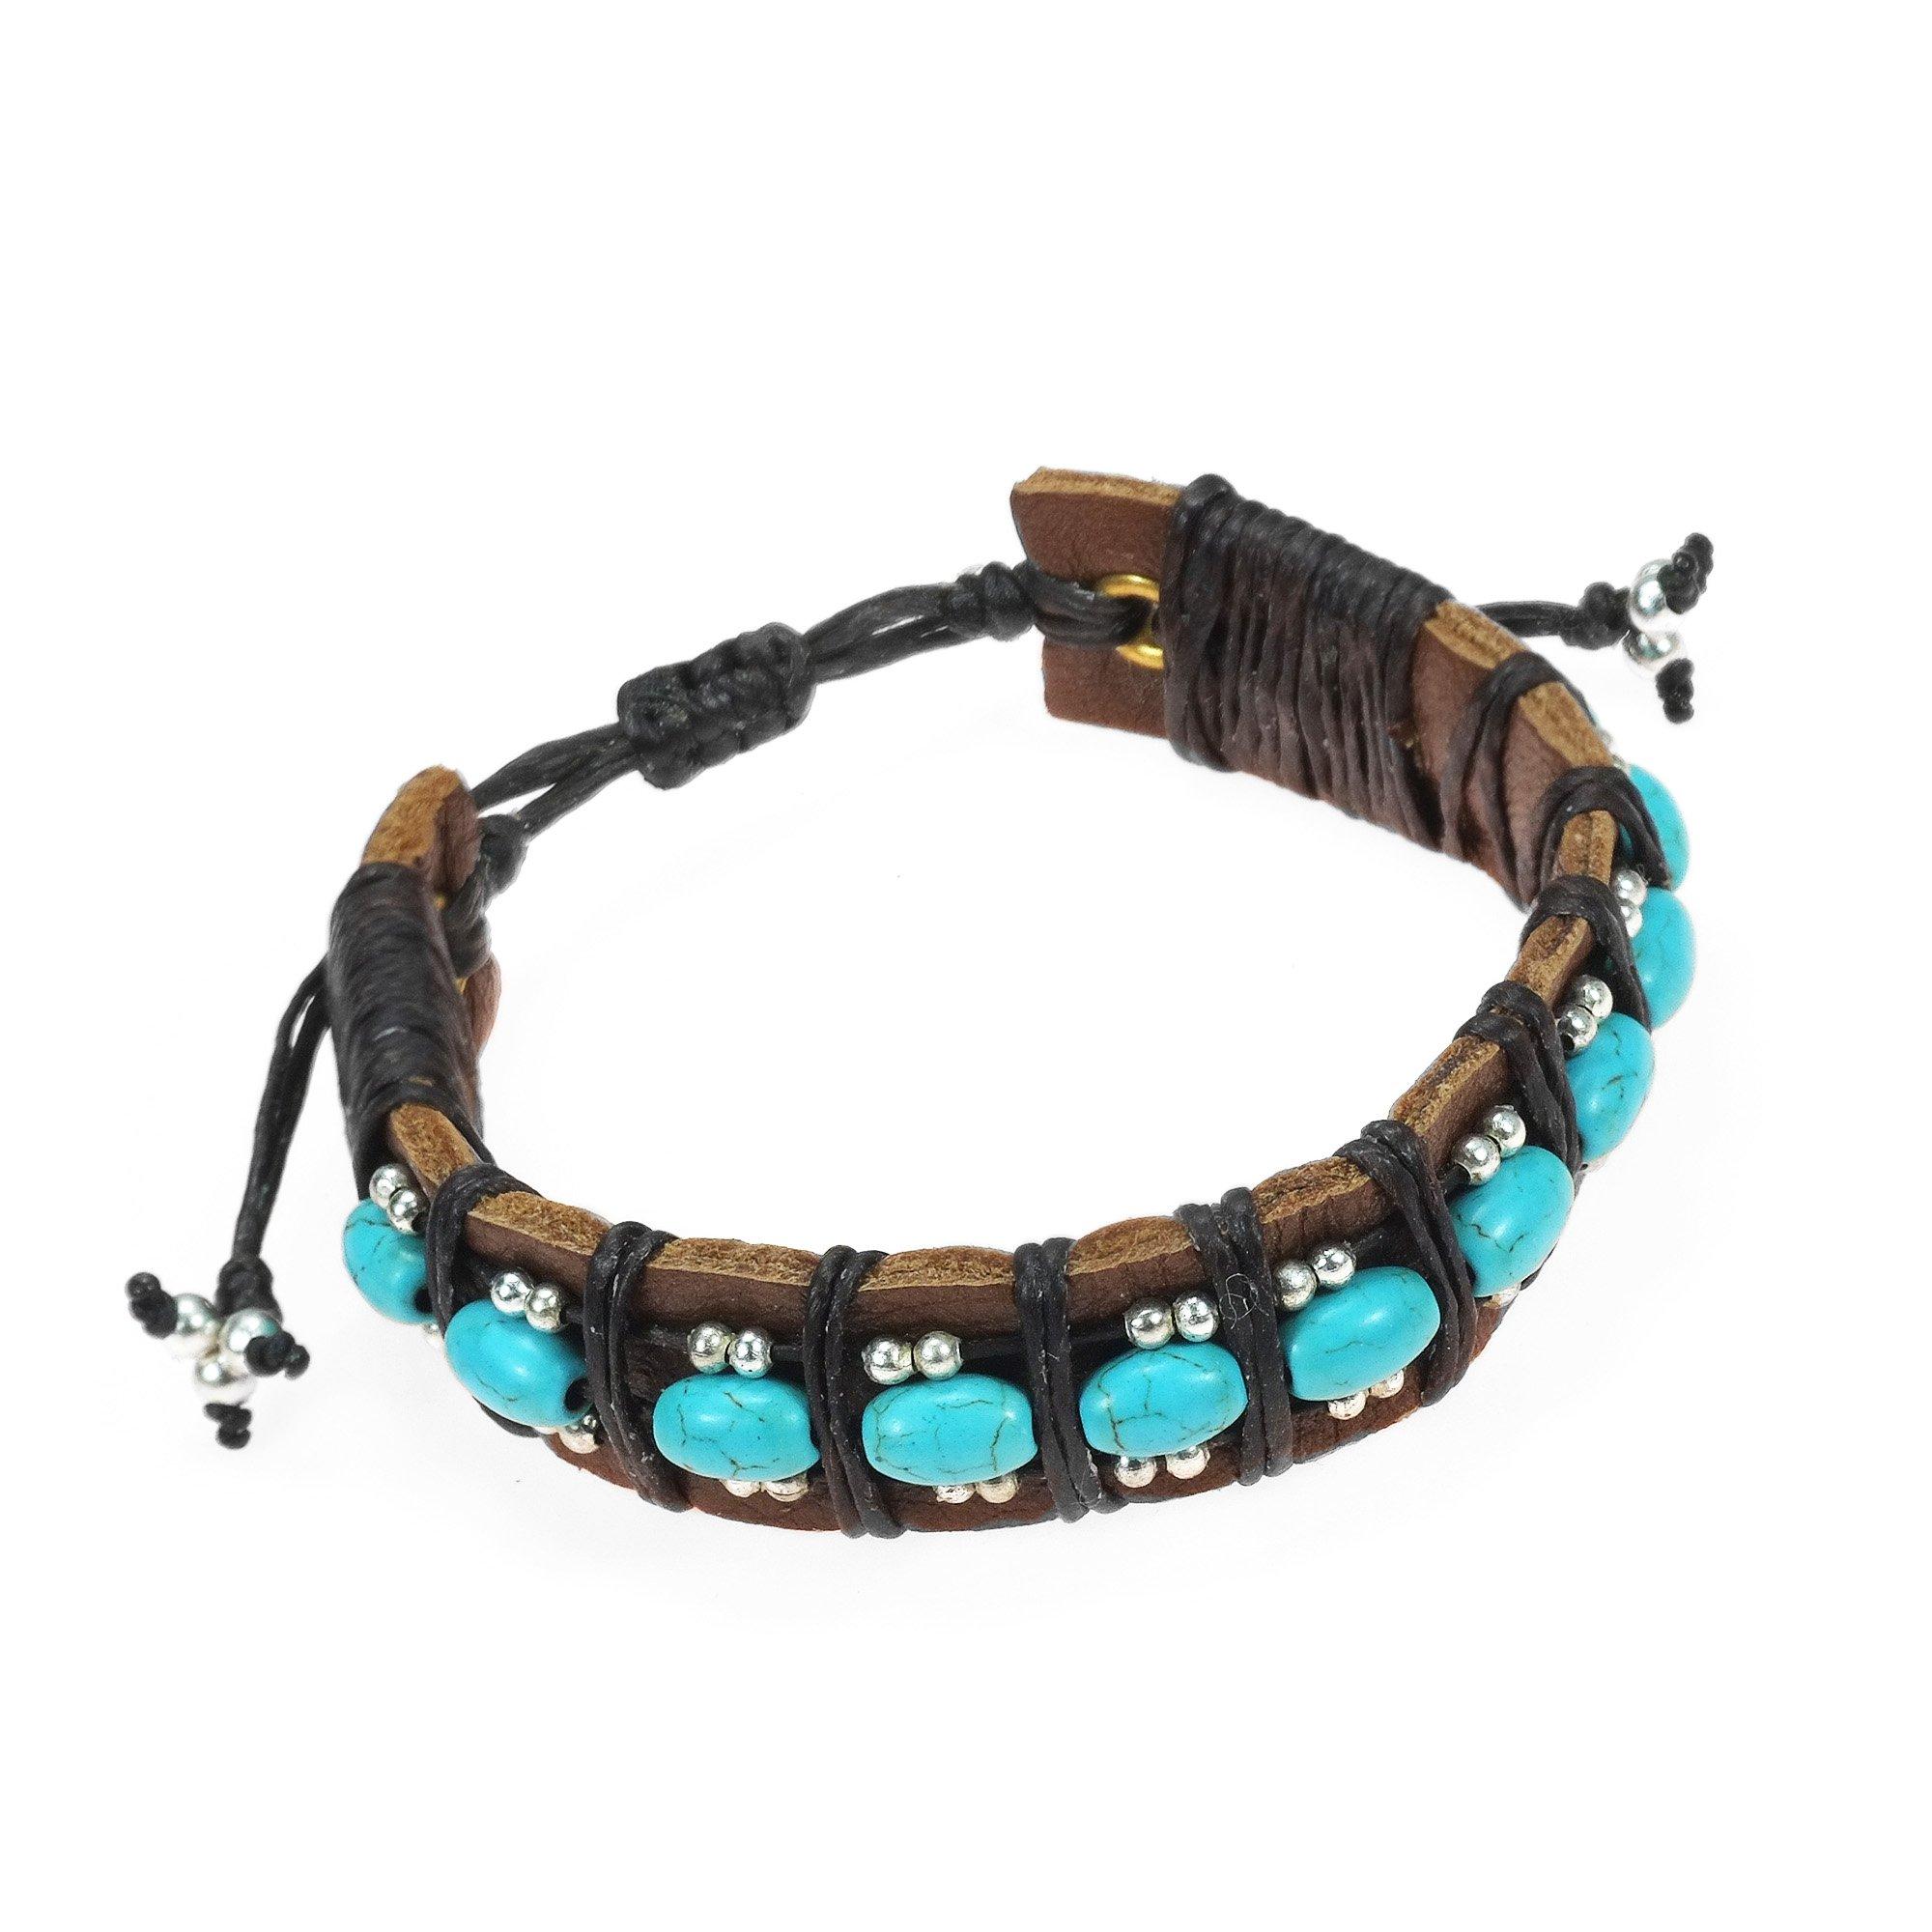 AeraVida Bohemian Simulated Turquoise and Fashion Silver Beads Leather Adjustable Wrist Pull Bracelet